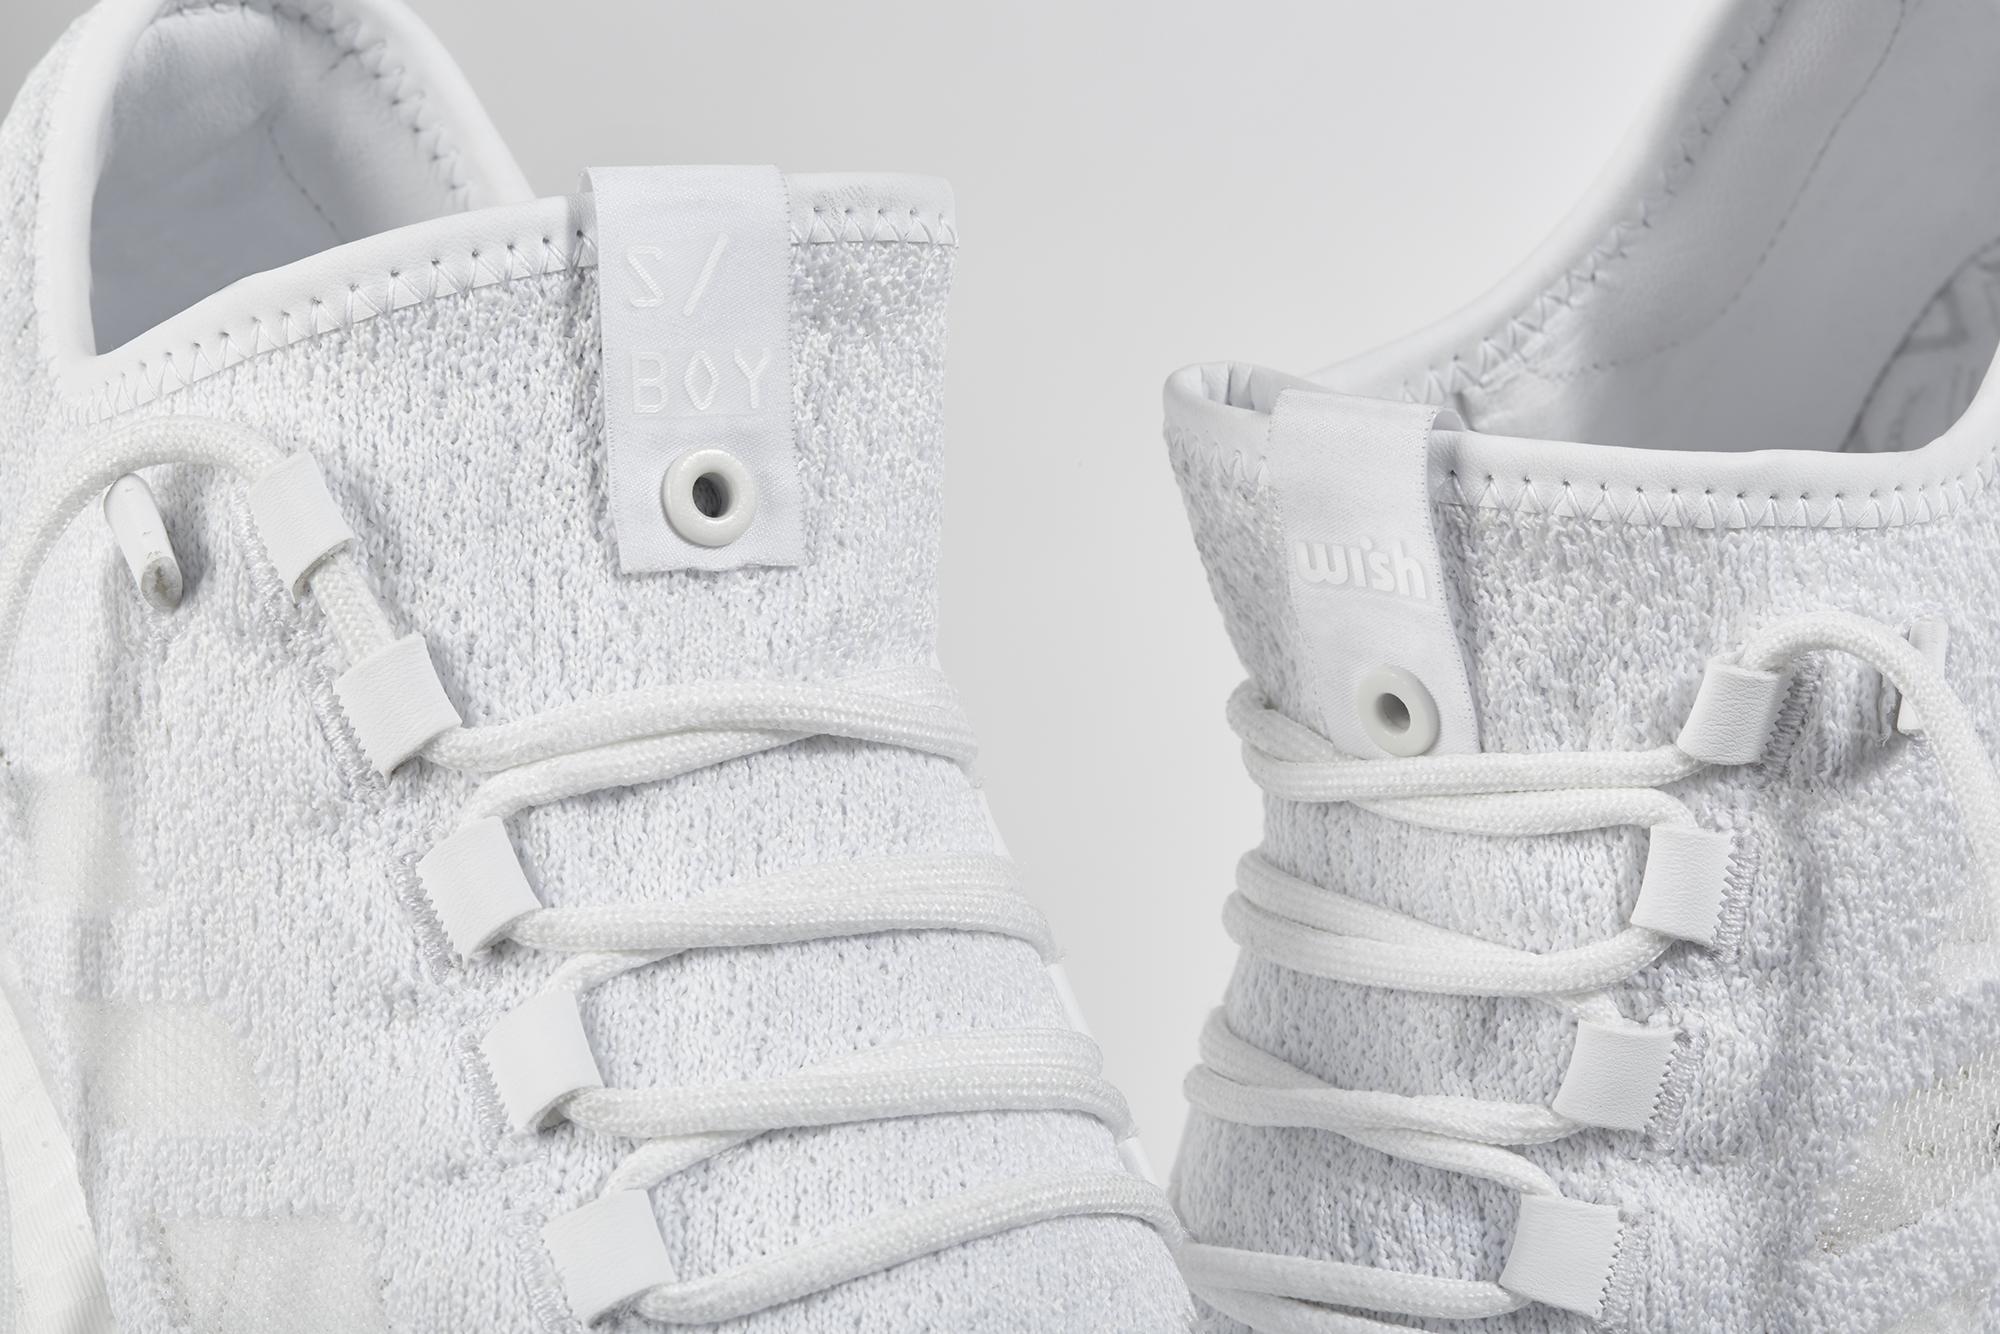 Consortium_SneakerboyXWish_Detail_Shot_1